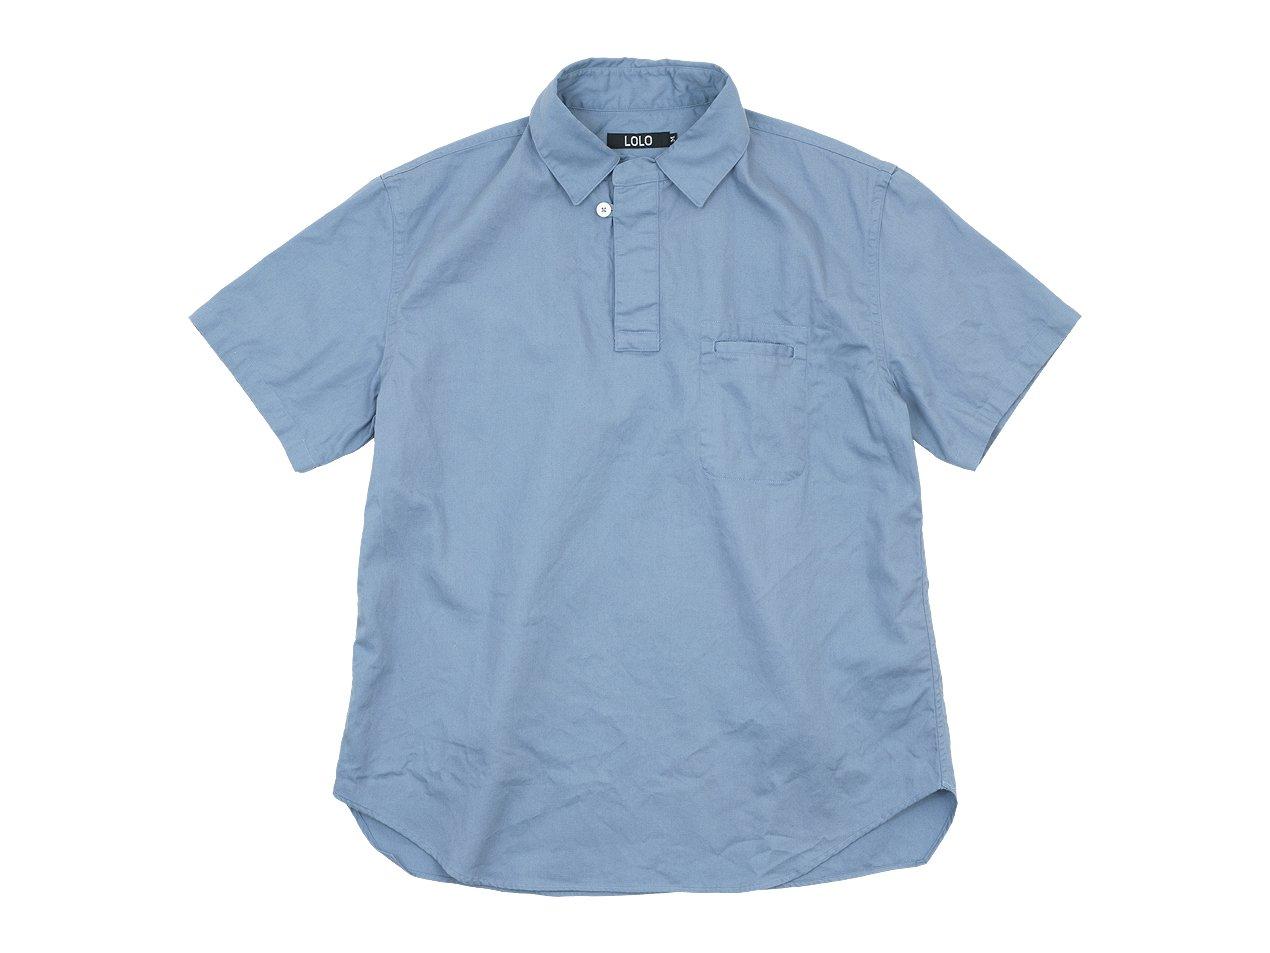 LOLO プルオーバー 半袖シャツ BLUE GRAY